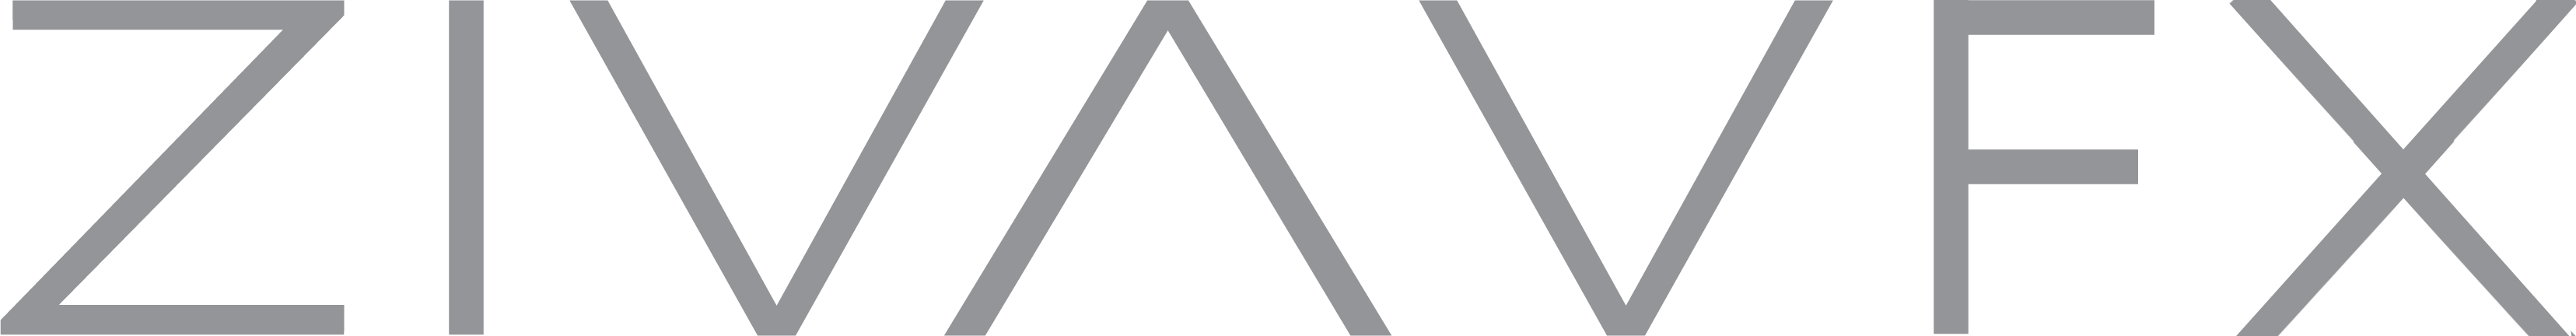 Shell clipart triangle object. Ziva dynamics vfx select